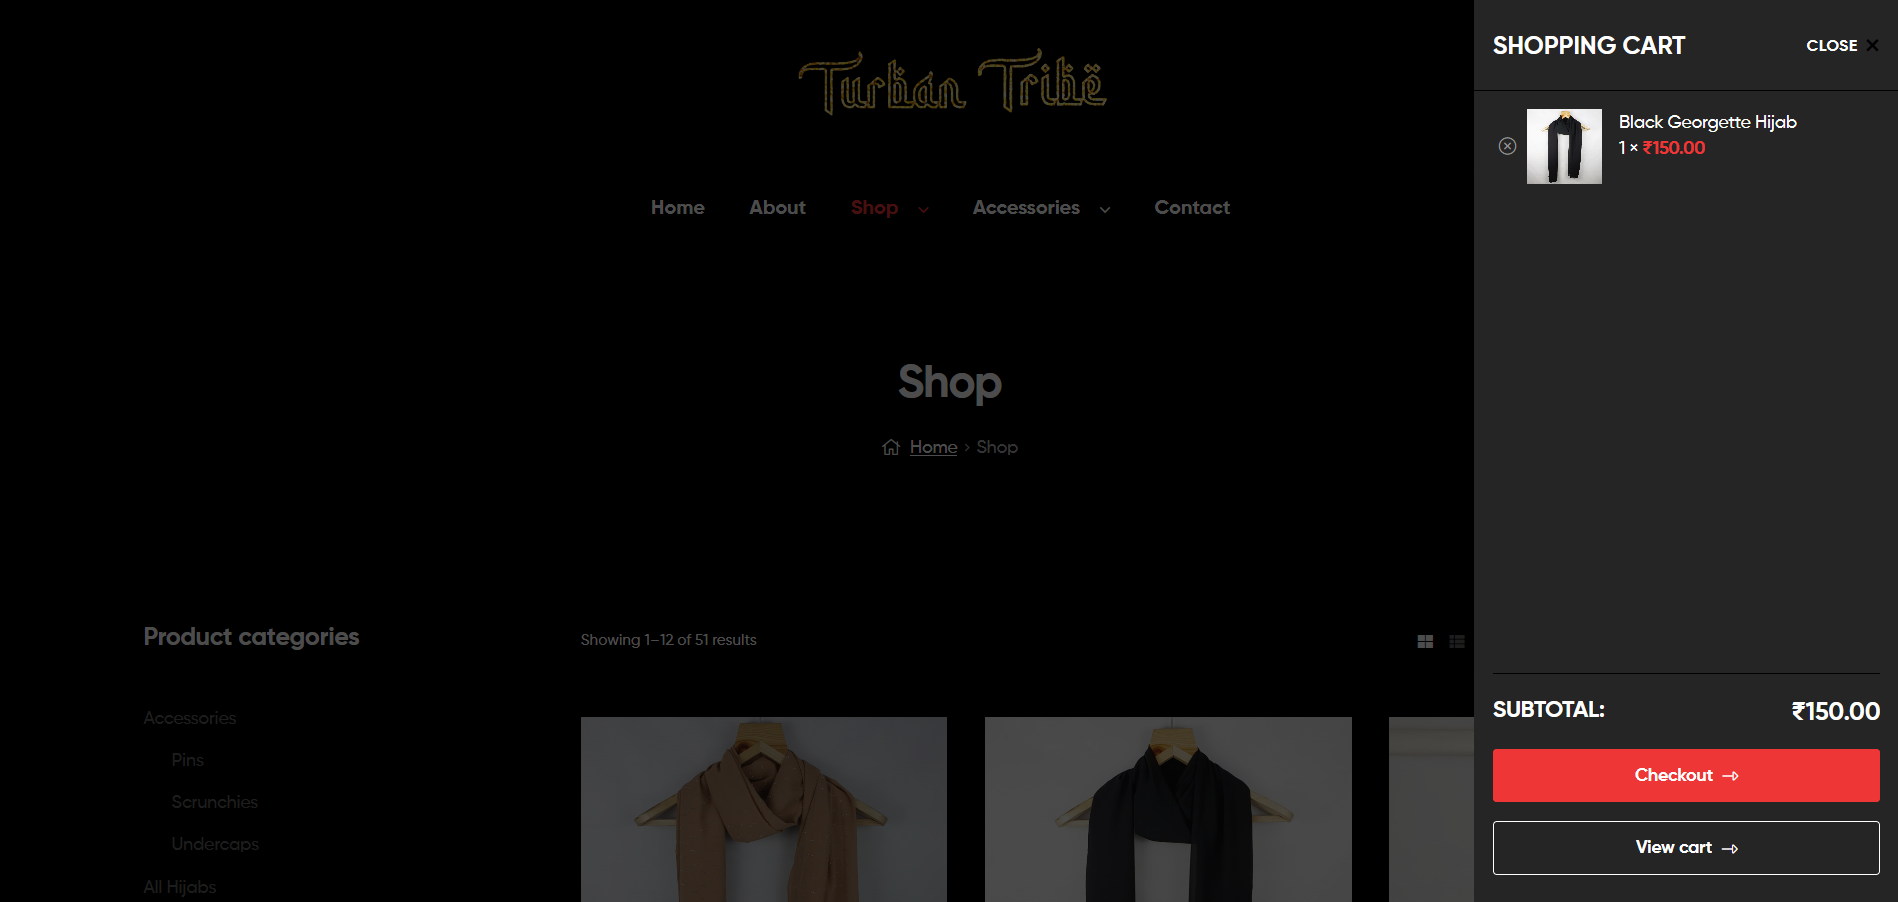 Screenshot_2021-03-03-Shop-Turban-Tribe.png